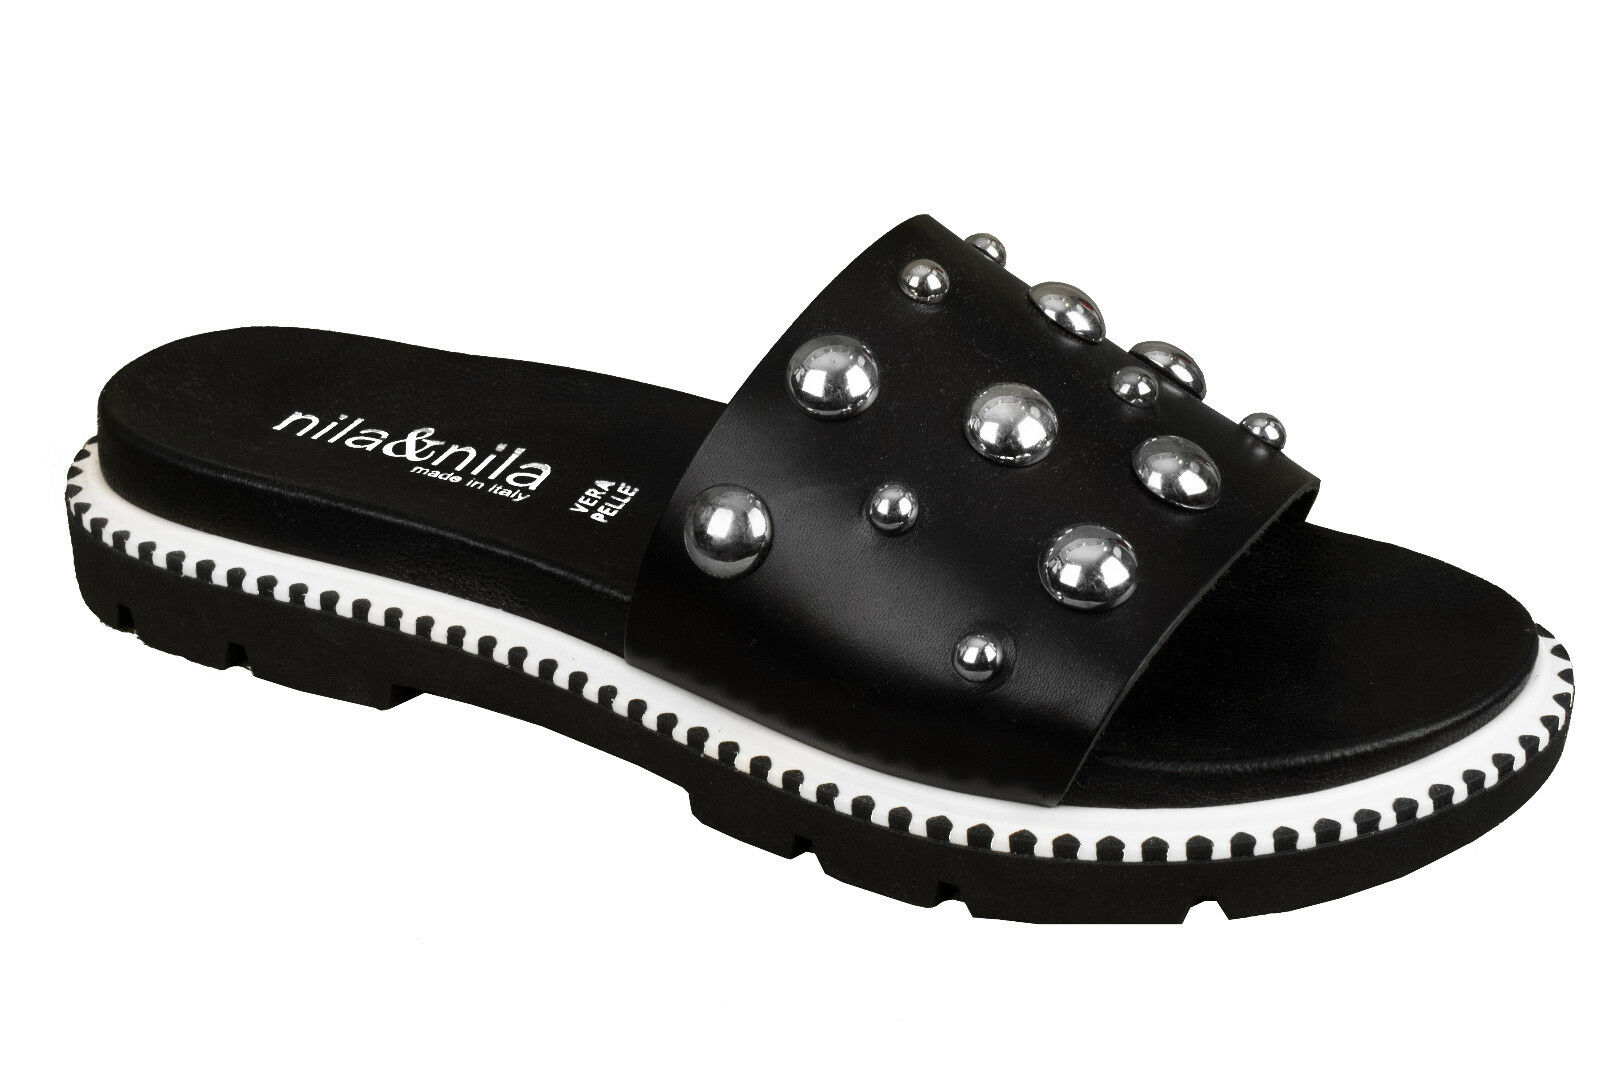 DAMEN LEDER Schuhe  Damenschuhe ITALY Sandalen Pantoletten Sommerschuhe ITALY Damenschuhe d6039e